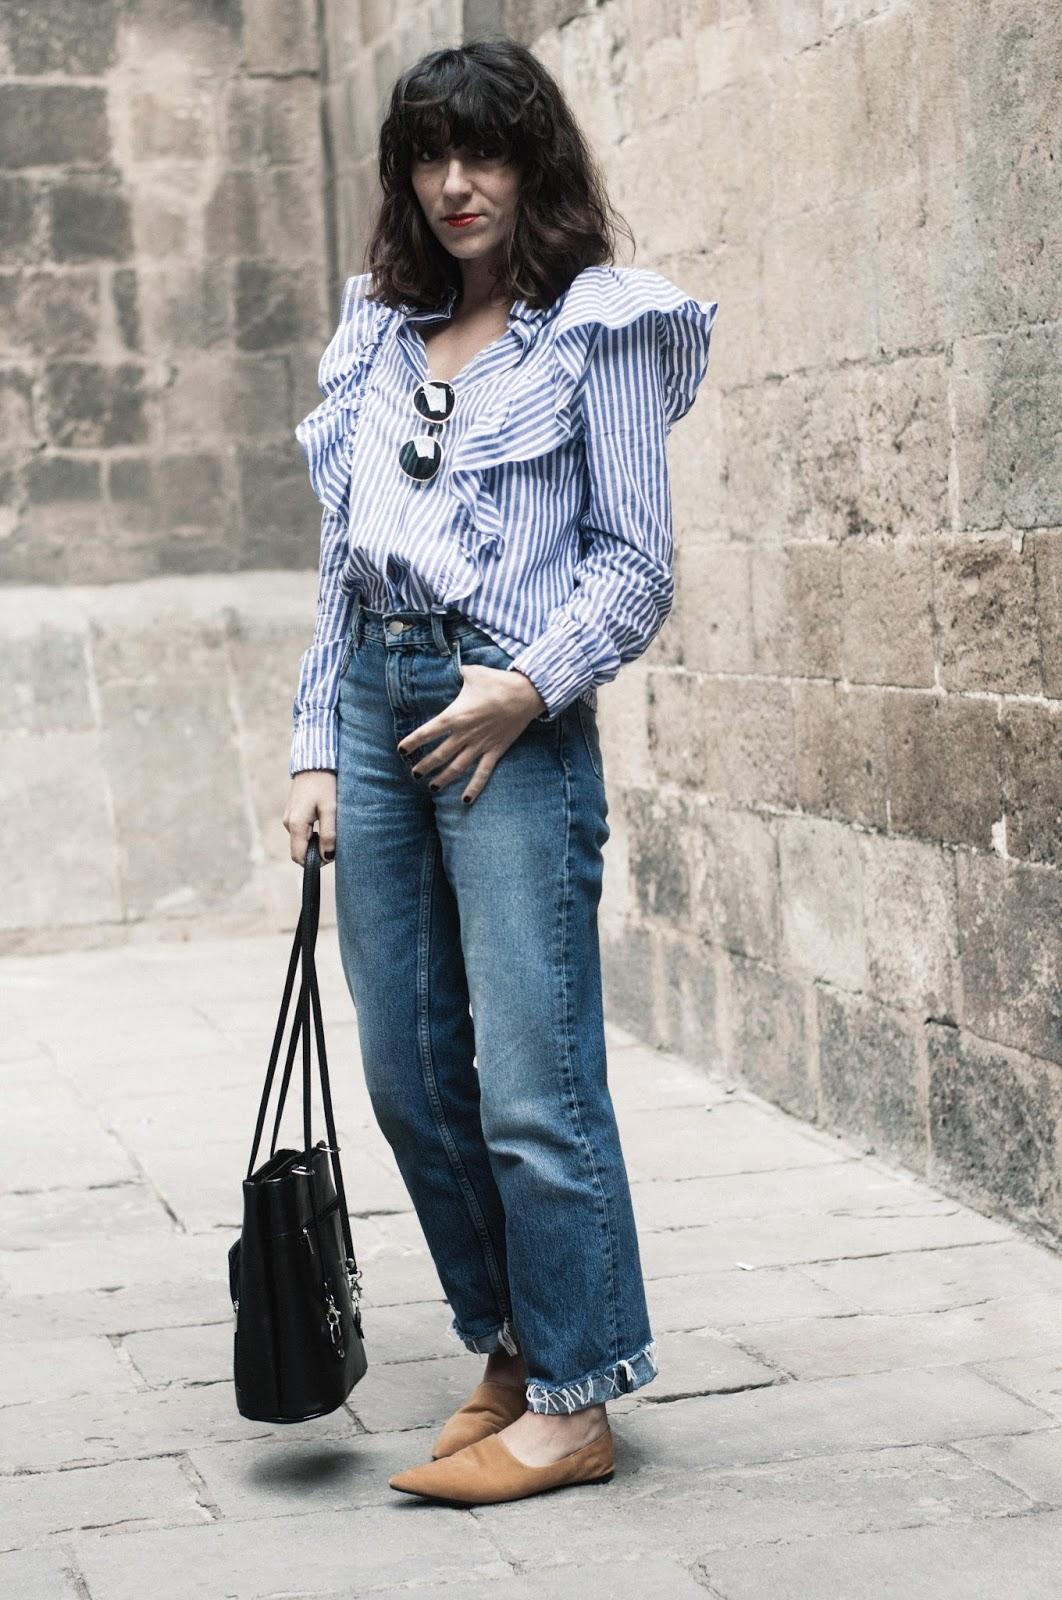 Camisa Bershka, jeans & Other Stories, mocasines slip-on H&M